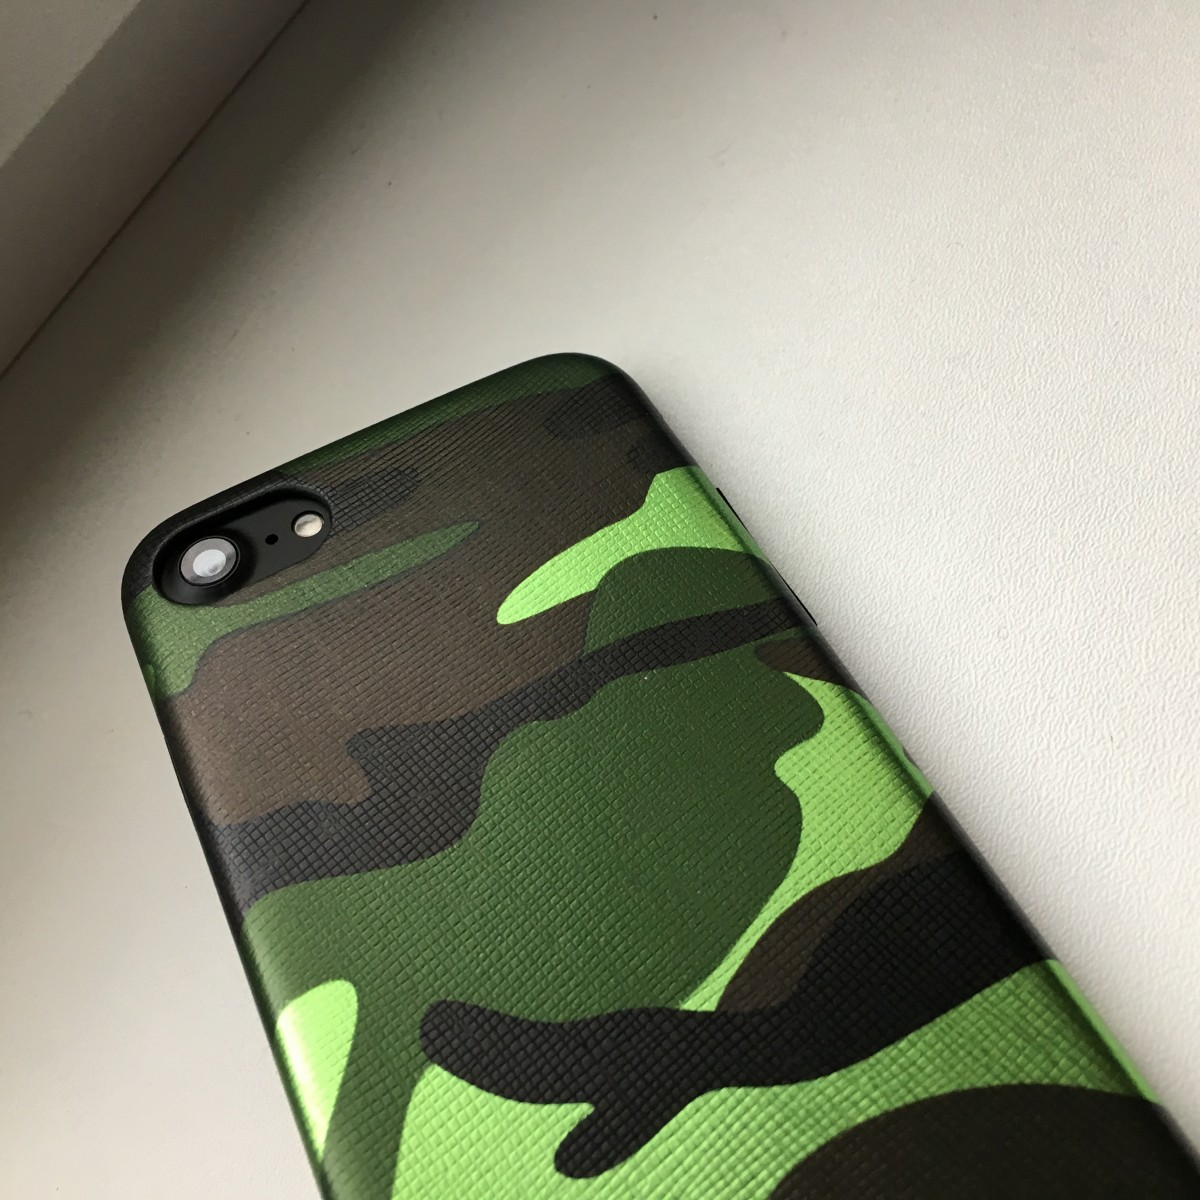 Pouzdro iMore Army Camouflage na iPhone 8/7 - Zelené